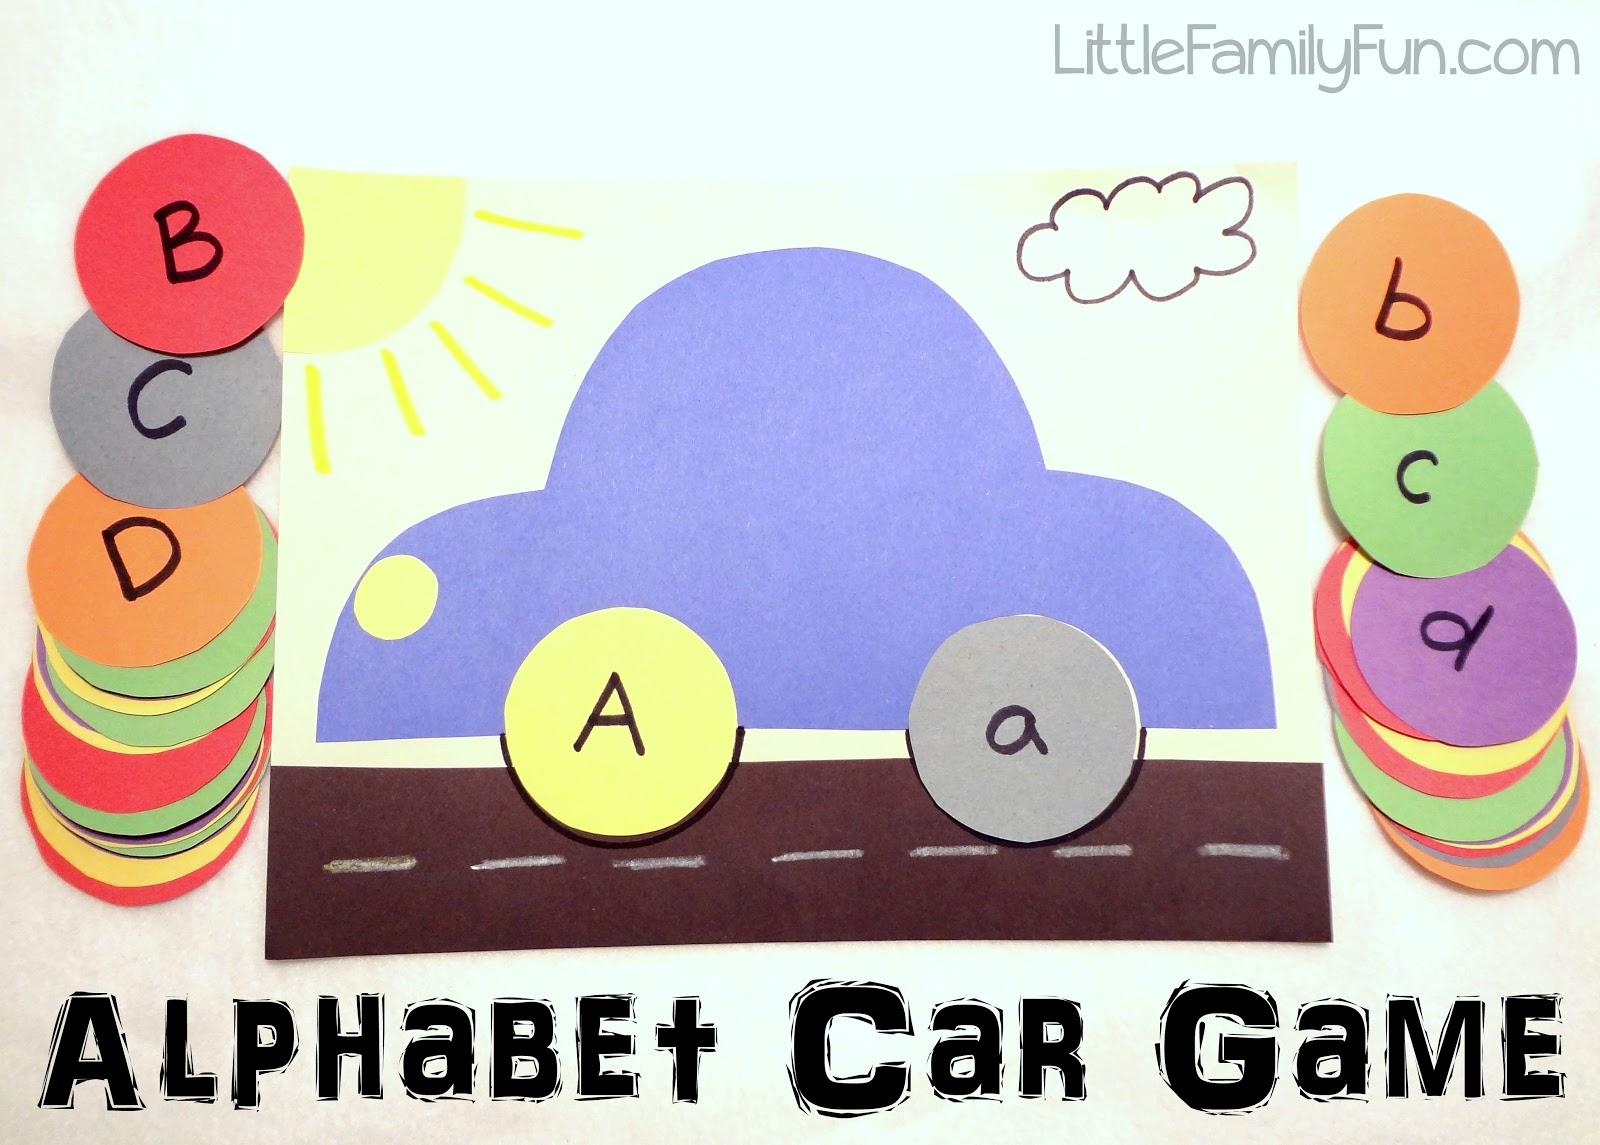 Little Family Fun Alphabet Car Game